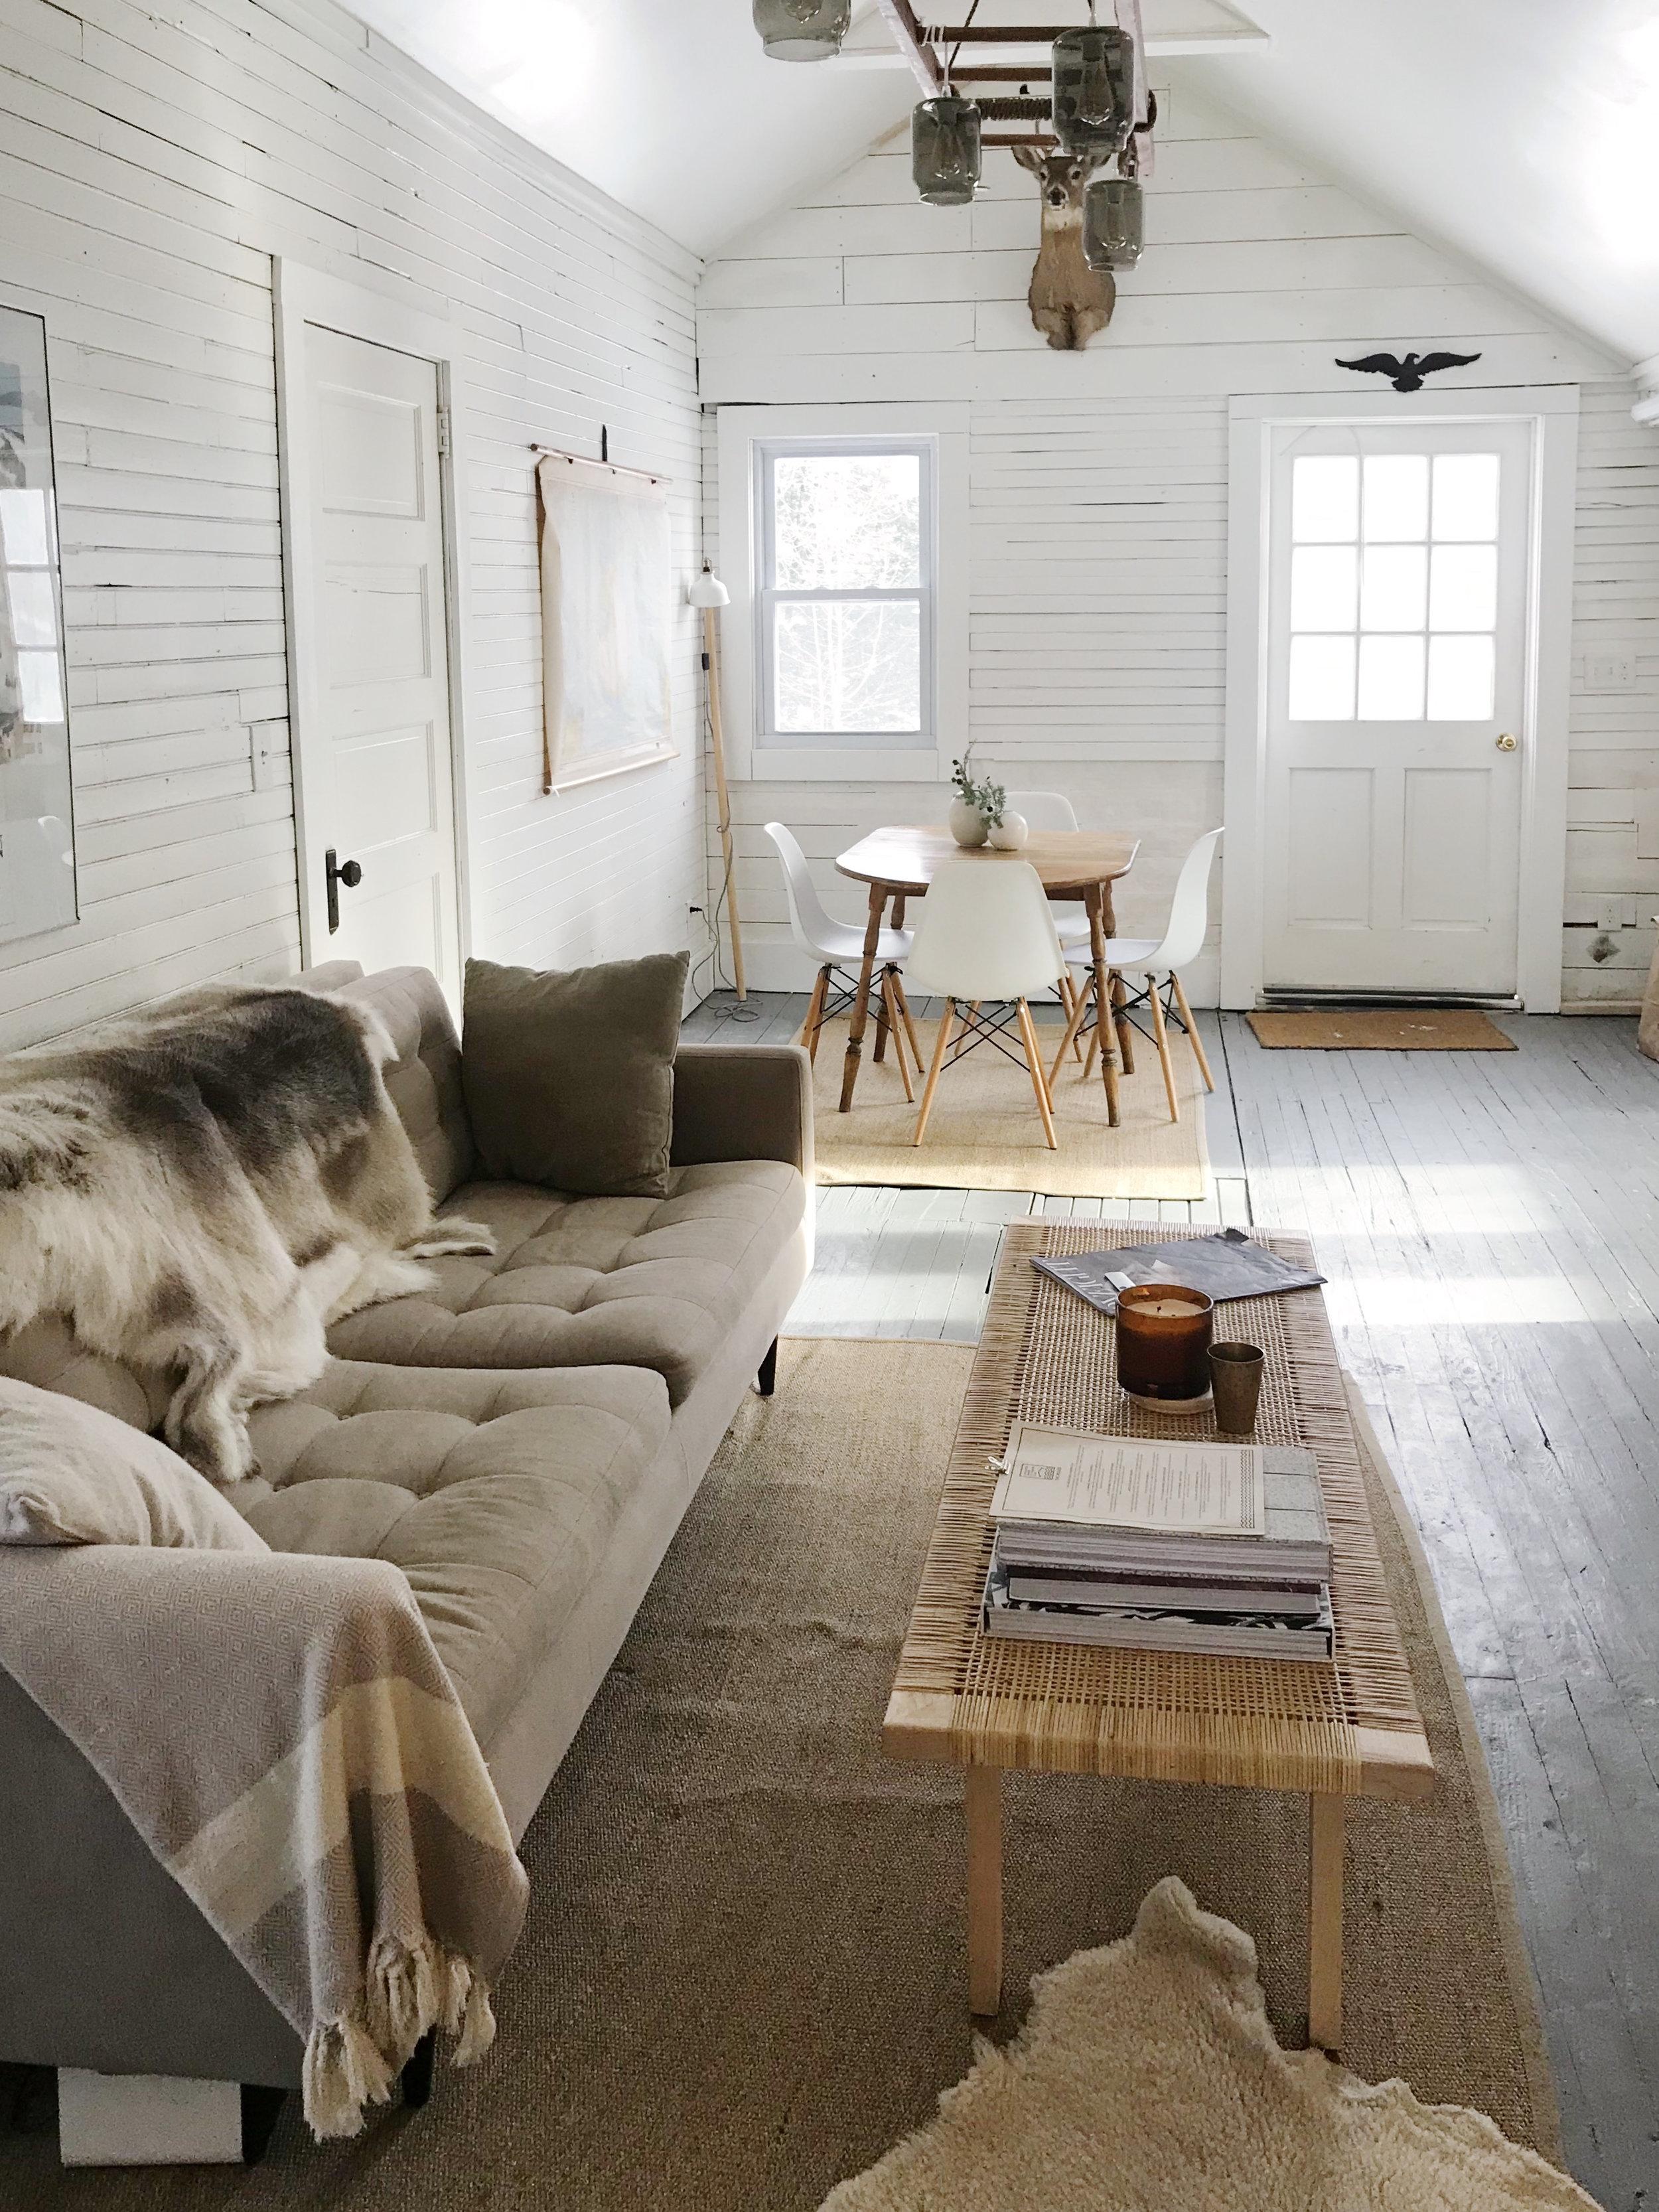 RedCottage_LMFFC_Loft_livingroom.jpg